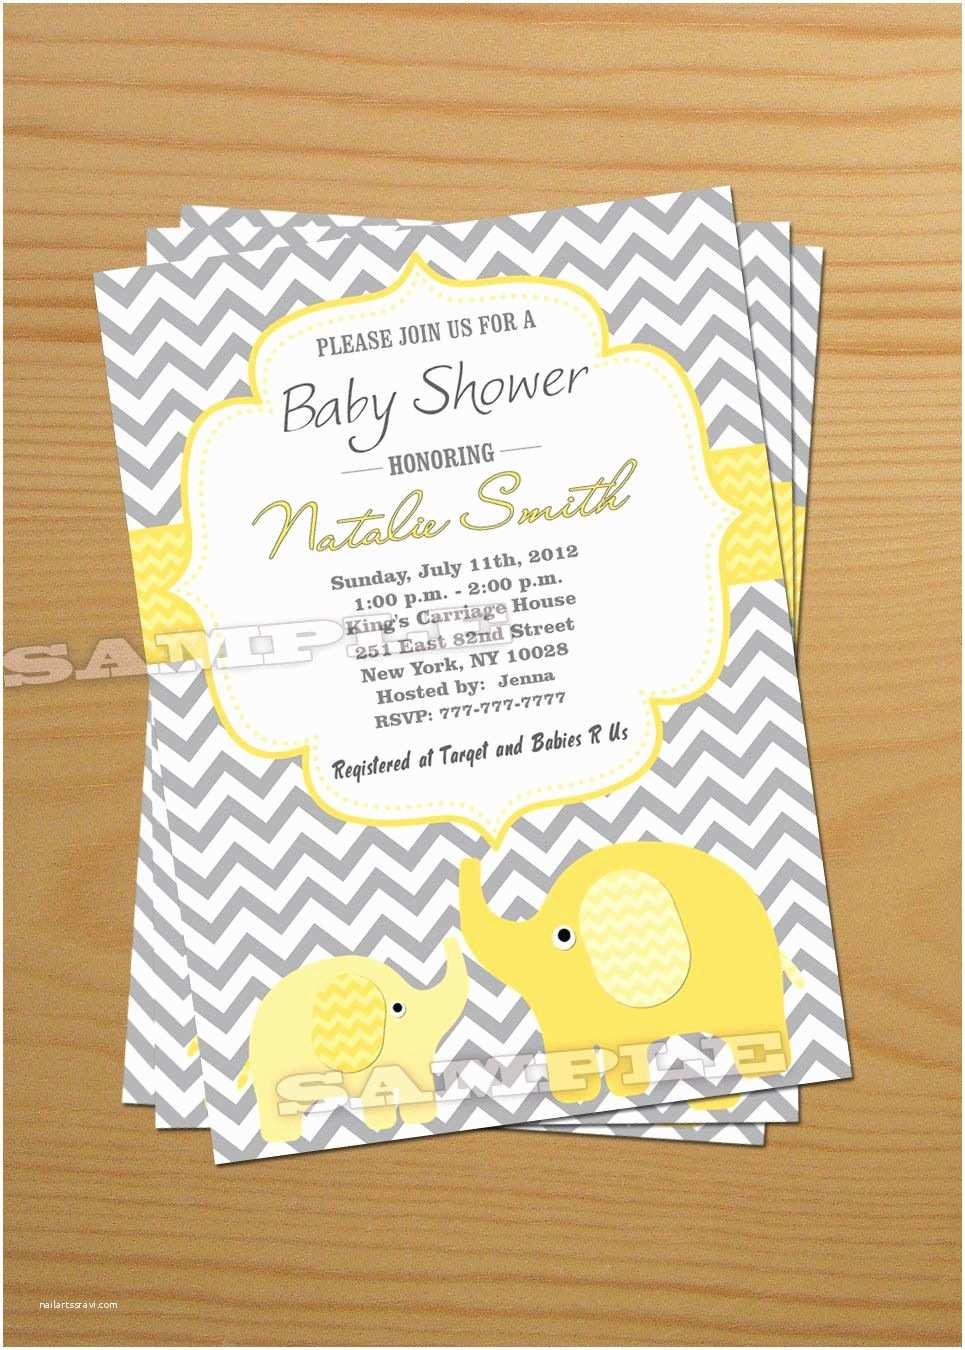 Baby Shower Elephant Invitations Elephant Baby Shower Invitation Gender Neutral Baby Shower